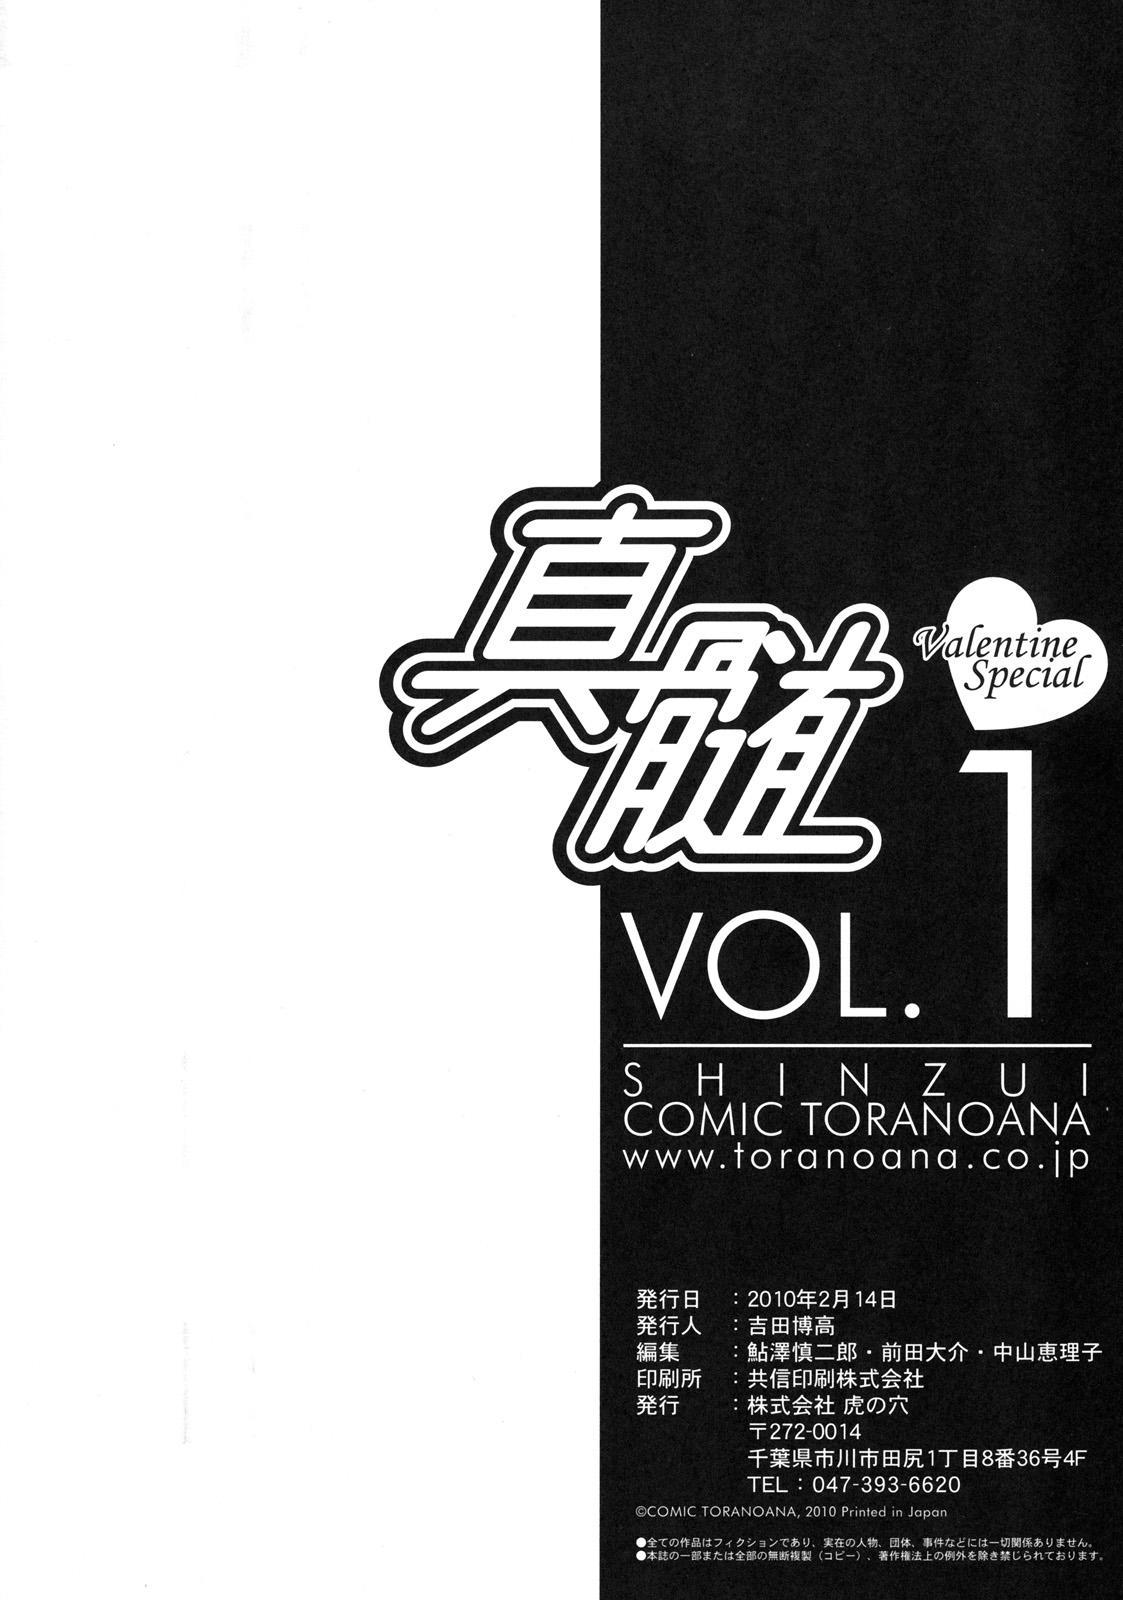 Shinzui Valentine Special Vol. 1 104